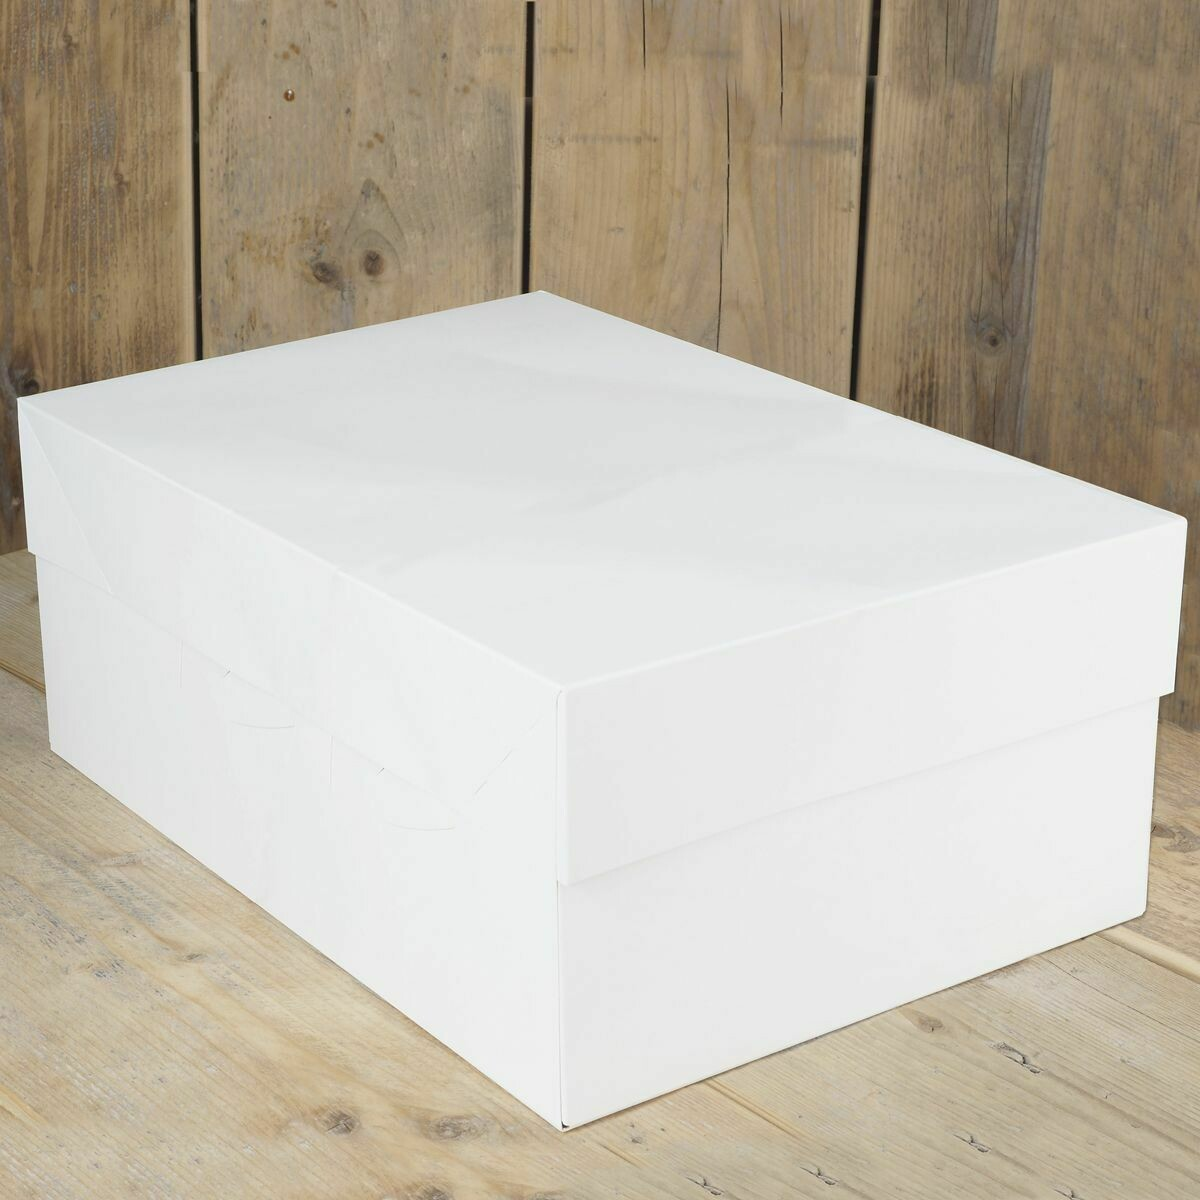 "Box -RECTANGLE 12""X16"" -Ορθογώνιο Κουτί 30 x 40εκ -με Ύψος 15εκ"